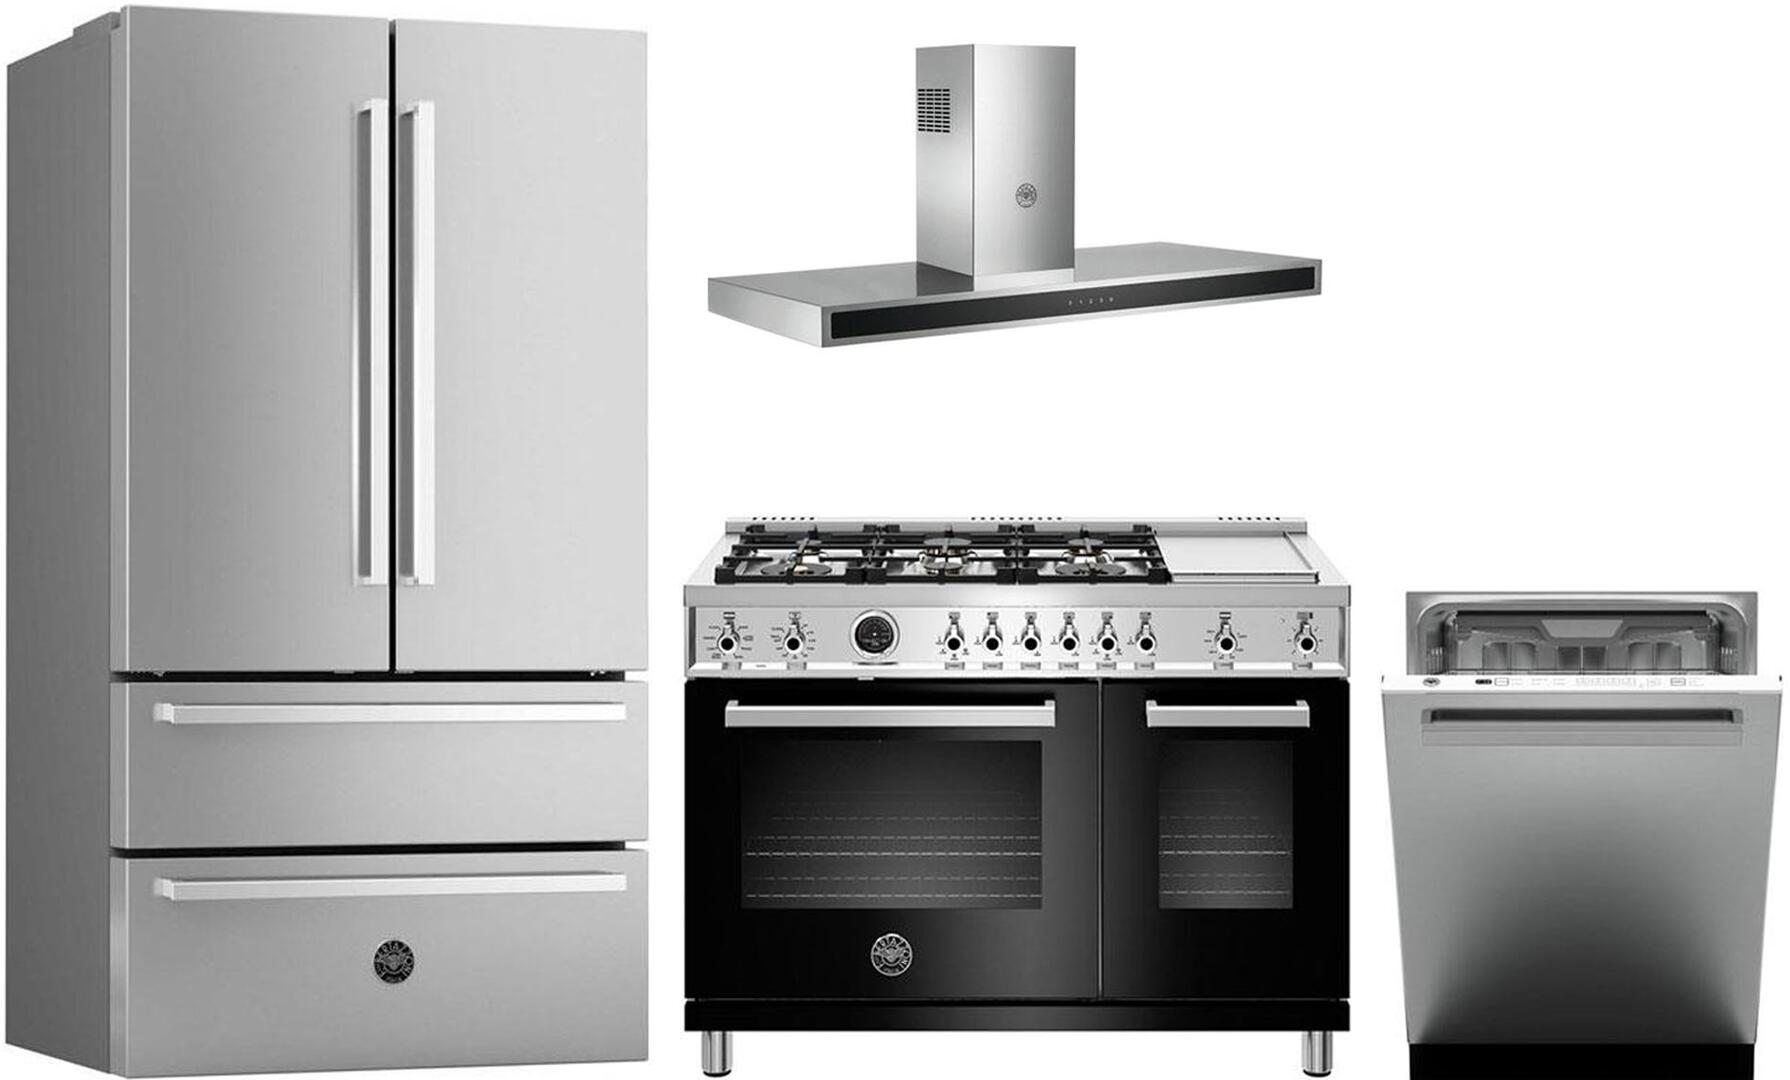 Bertazzoni 974097 4 piece Stainless Steel Kitchen Appliances Package